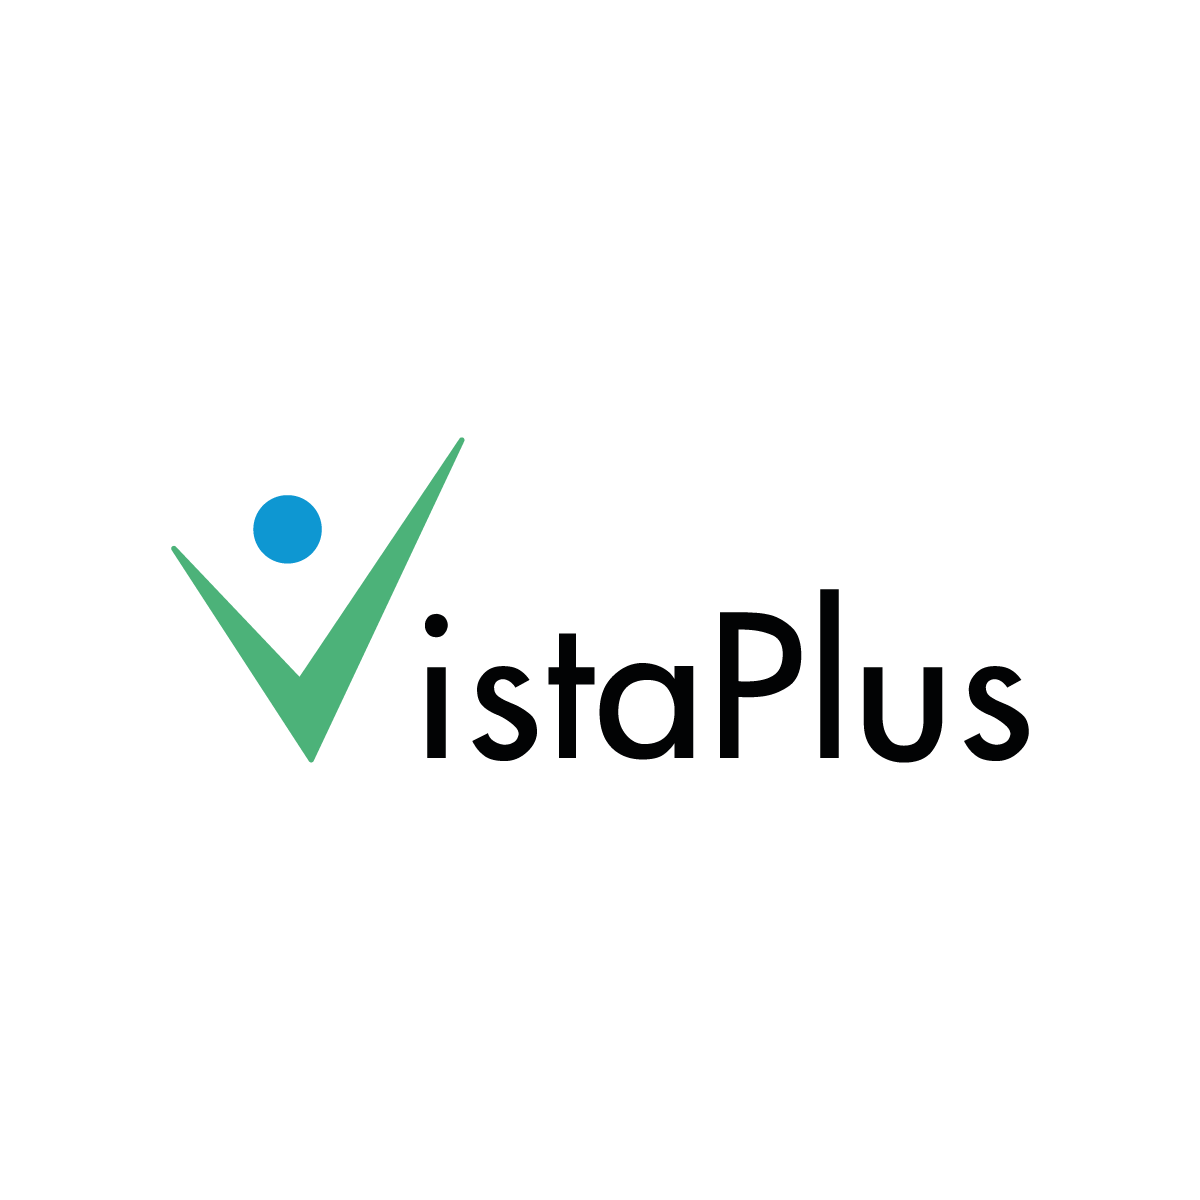 VistaPlus